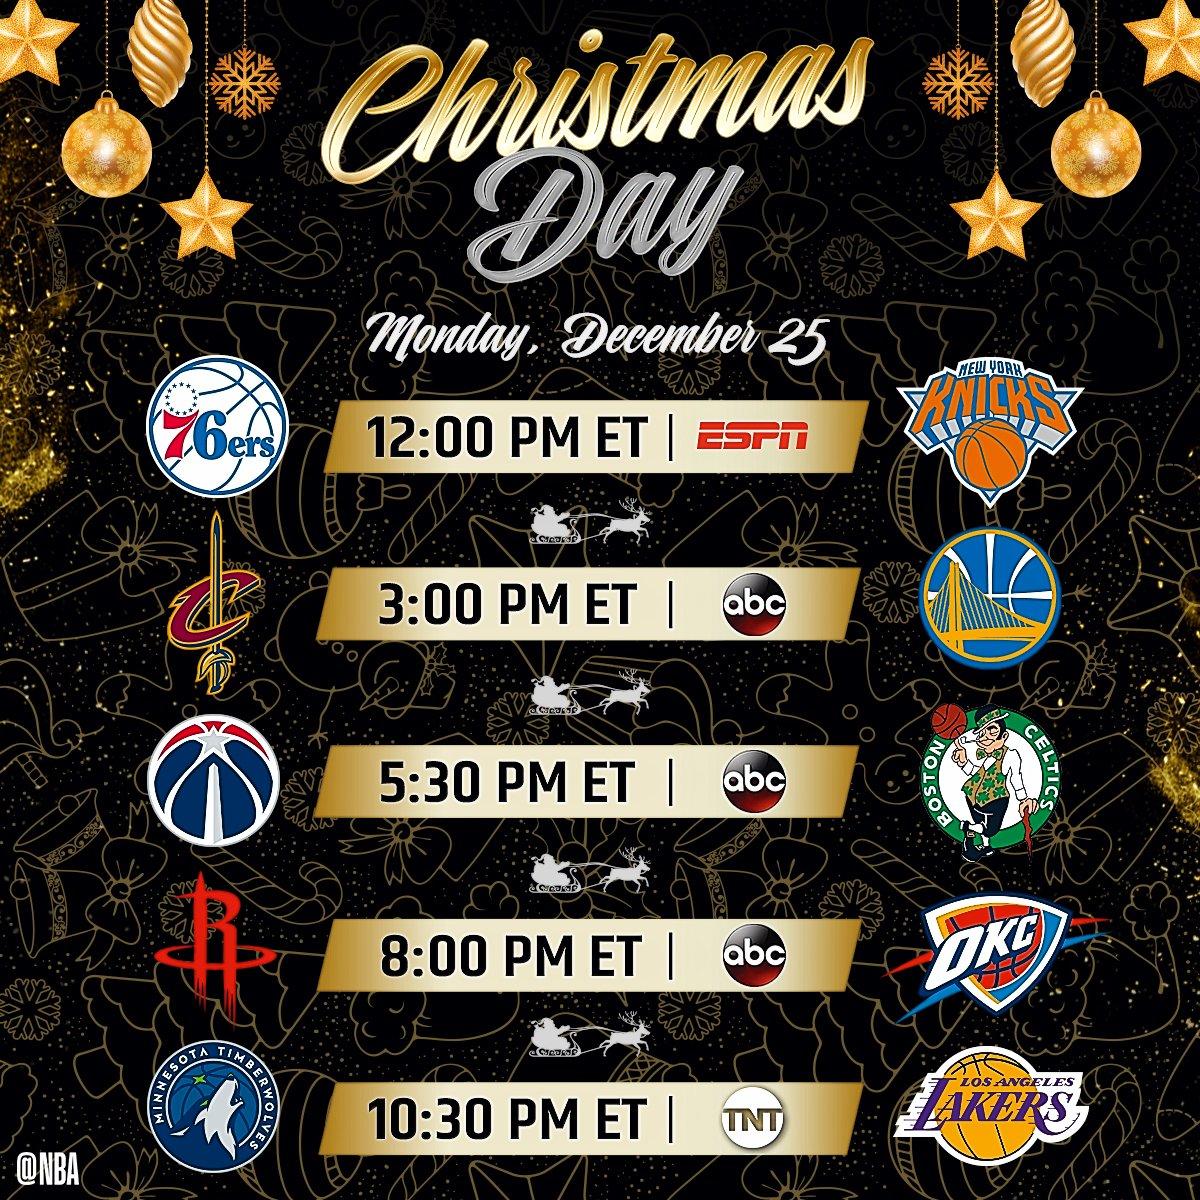 nba on twitter the 2017 nbaxmas day schedule 12et sixersknicks 3et cavswarriors 530et wizardsceltics 8et rocketsthunder 1030et - Nba Christmas Day